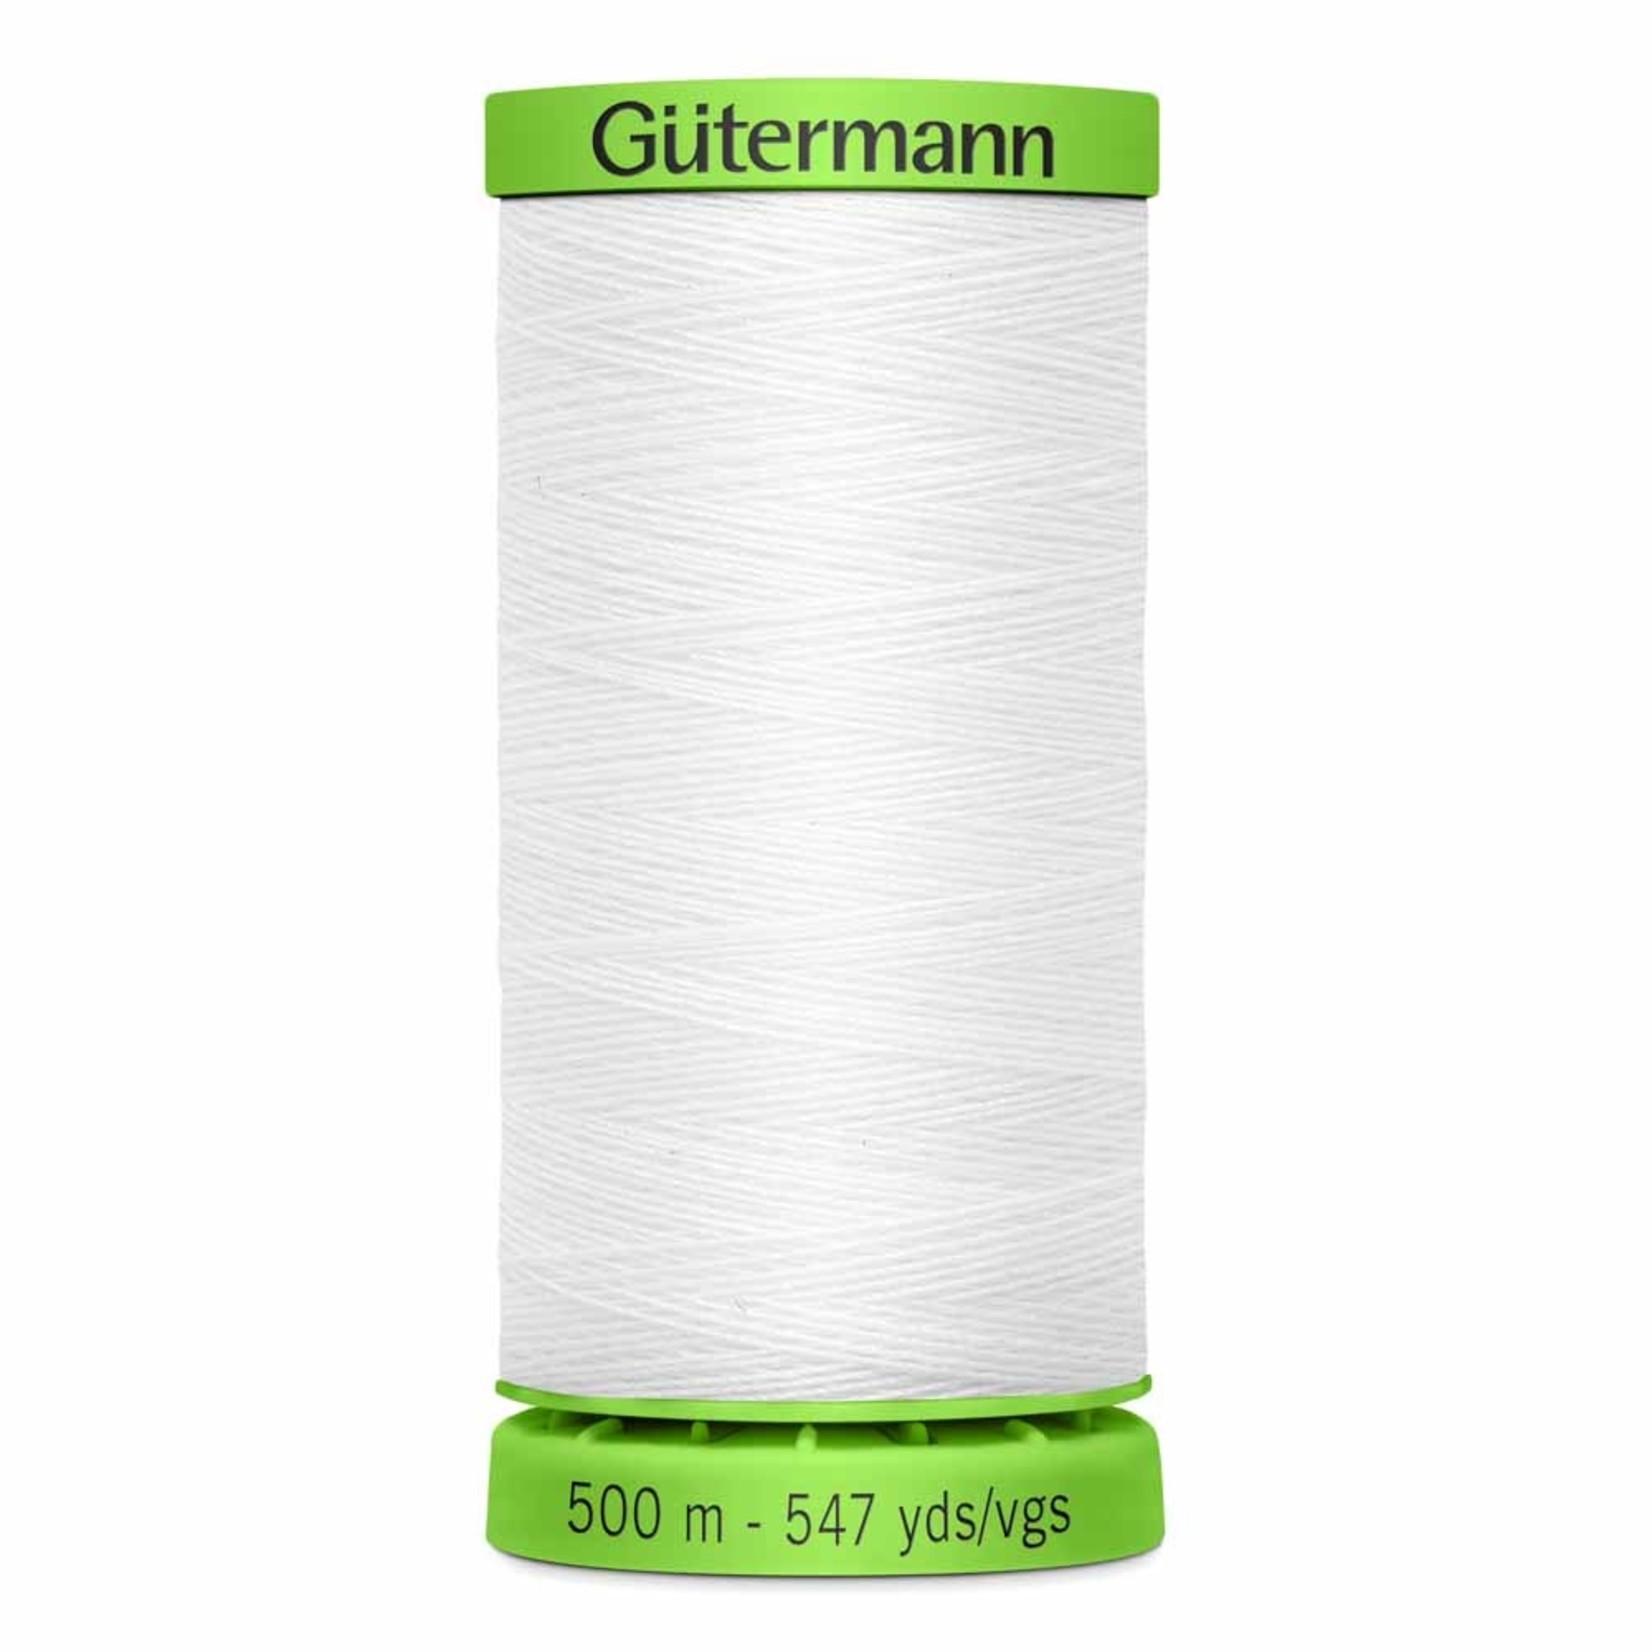 Gutermann Gutermann Bobbin - M202 Polyester